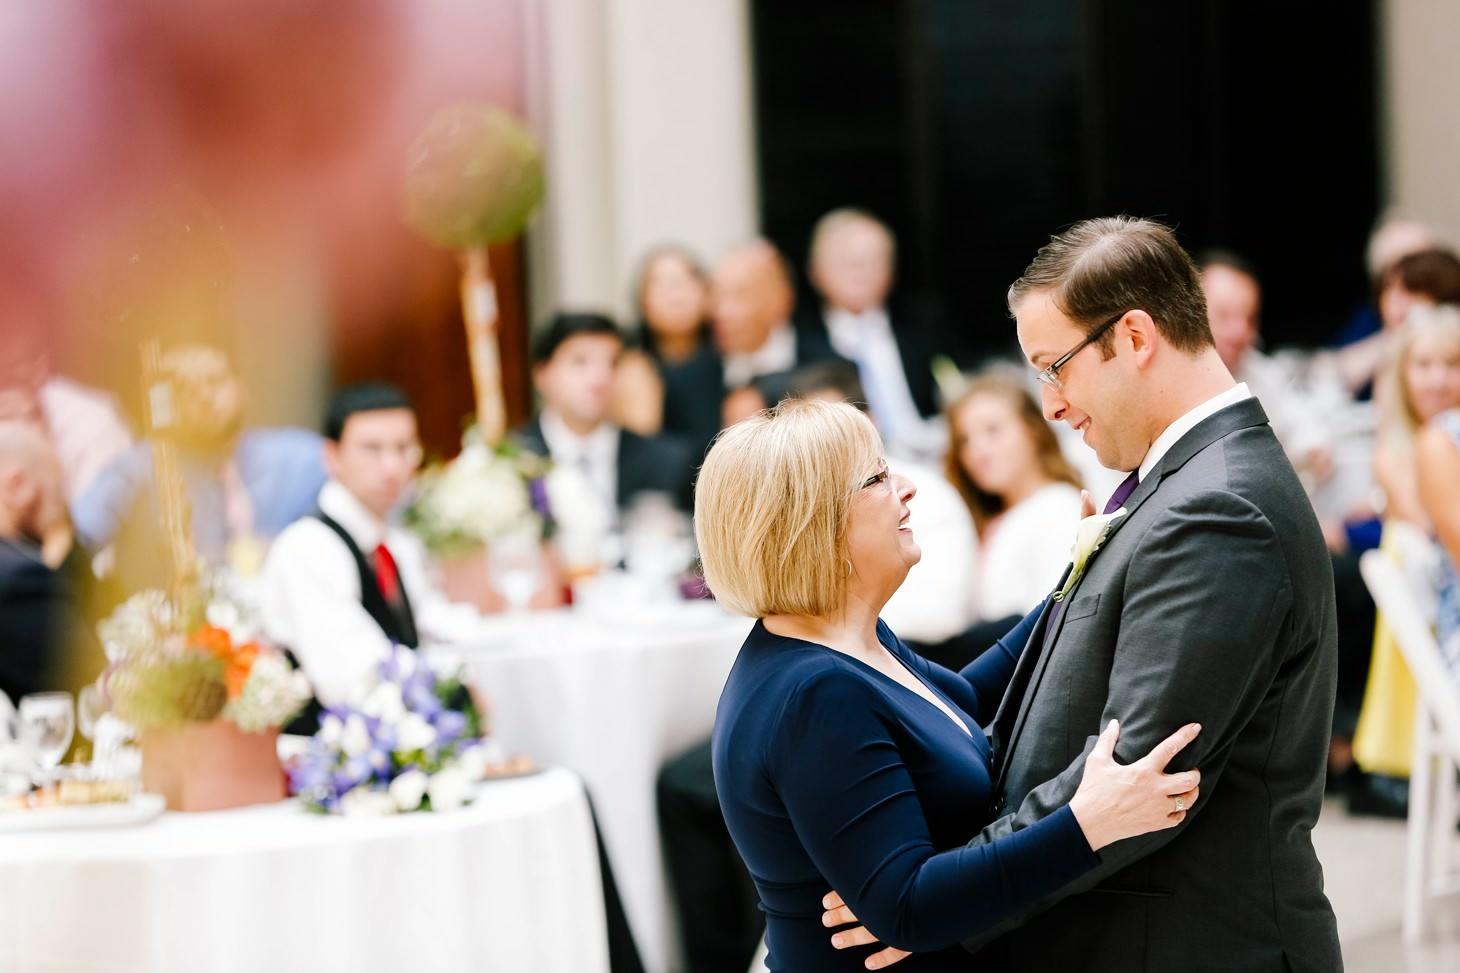 056-nyc-wedding-photographer-hoboken-waterfront-wedding-photos-smitten-chickens.jpg